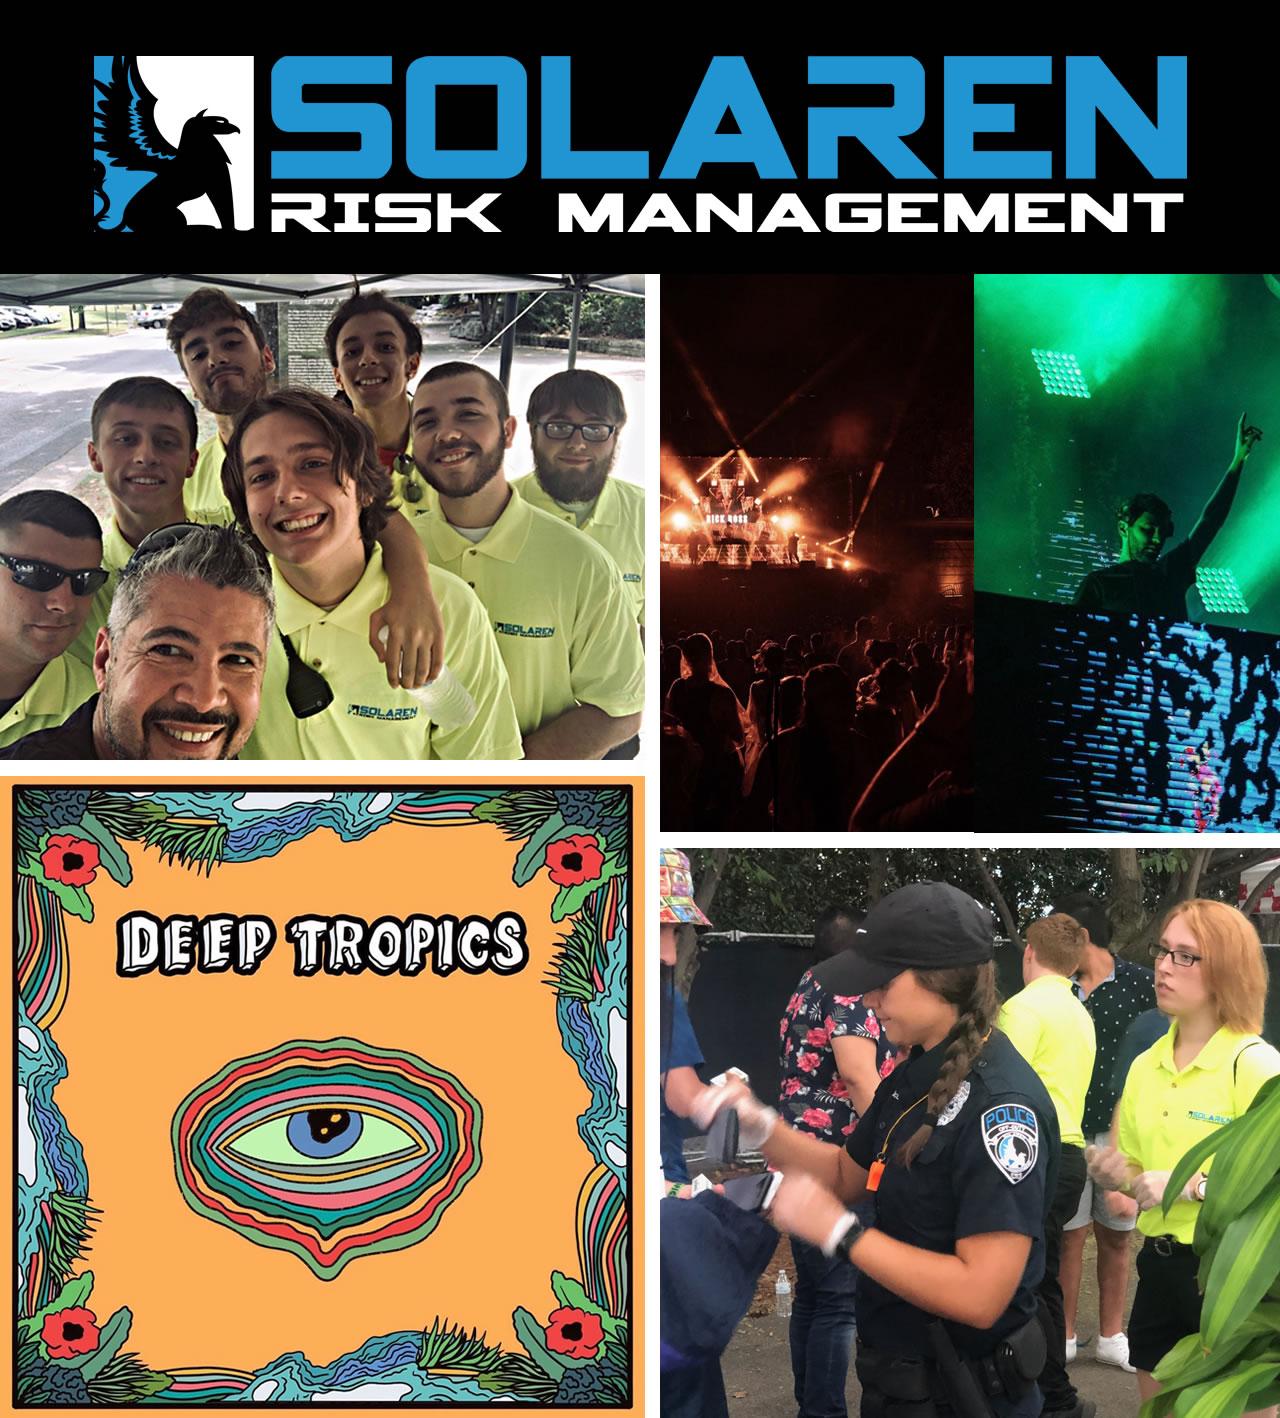 Deep Tropics Music, Art, & Style Festival, Event Security Nashville Police Security